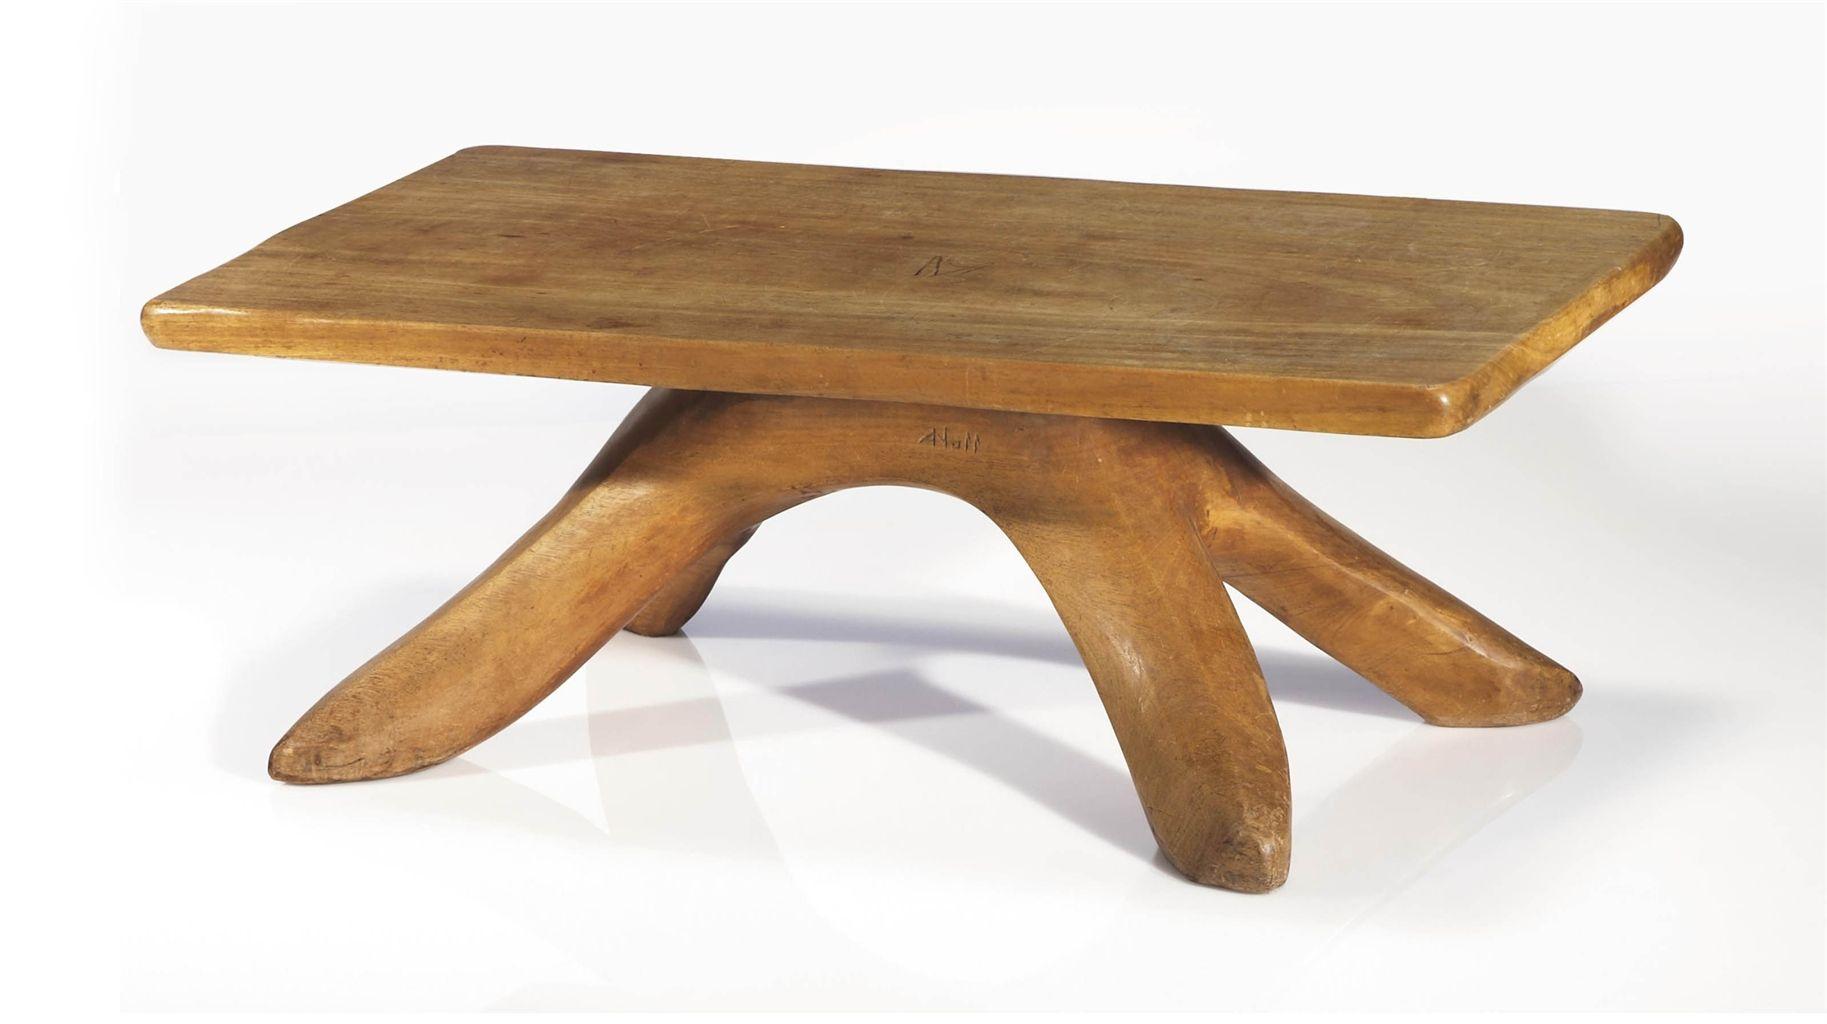 Alexandre Noll 1890 1970 Table Basse Vers 1940 1950 En Noyer Sculpte Hauteur 42 Cm 16 In Longueur 114 Cm 4 Table Basse Table Basse Design Table